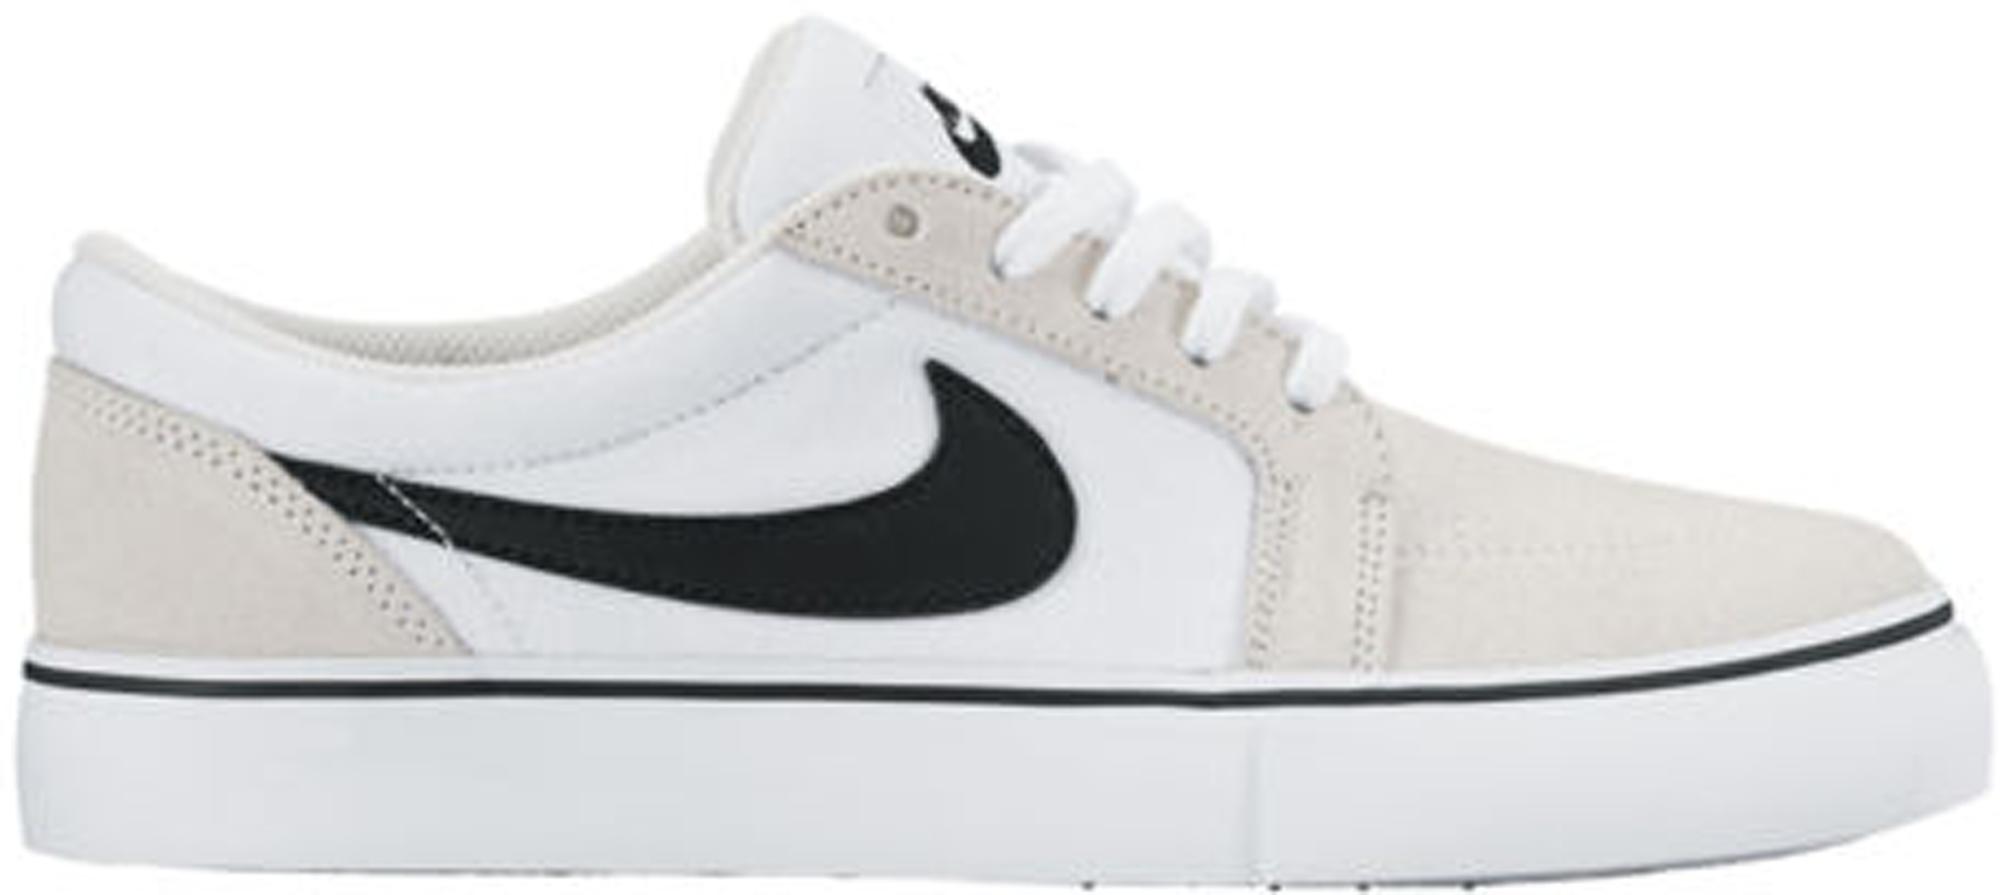 Nike SB Satire II Summit White Black